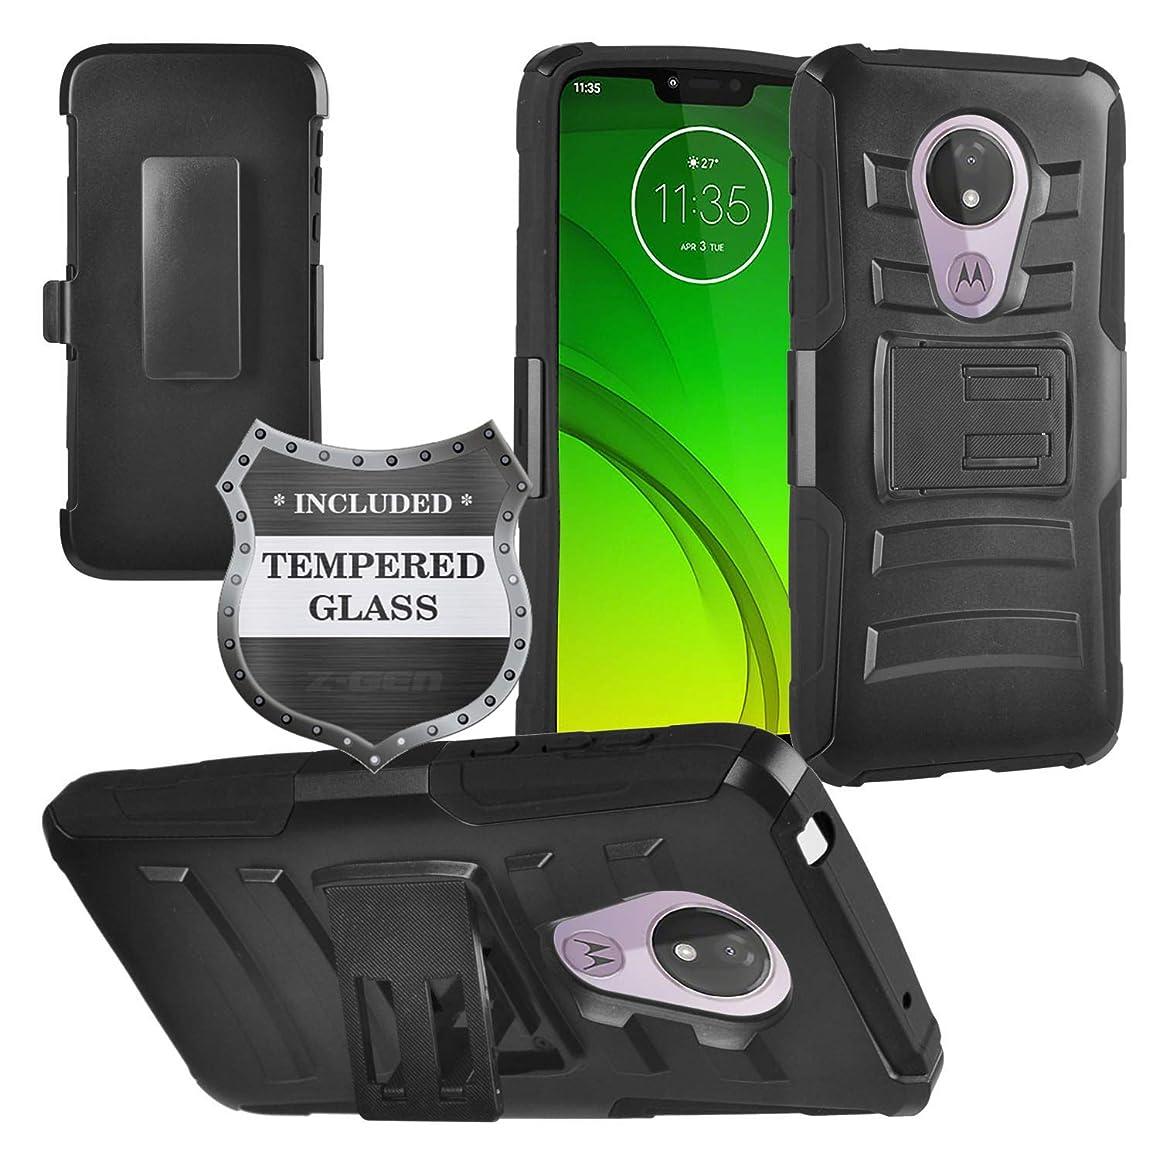 Z-GEN - for Motorola Moto G7 Power (U.S. Version), Moto G7 Supra, Moto G7 Optimo Maxx XT1955DL - Hybrid Armor Phone Case w/Stand/Belt Clip Holster + Tempered Glass Screen Protector - CV1 Black